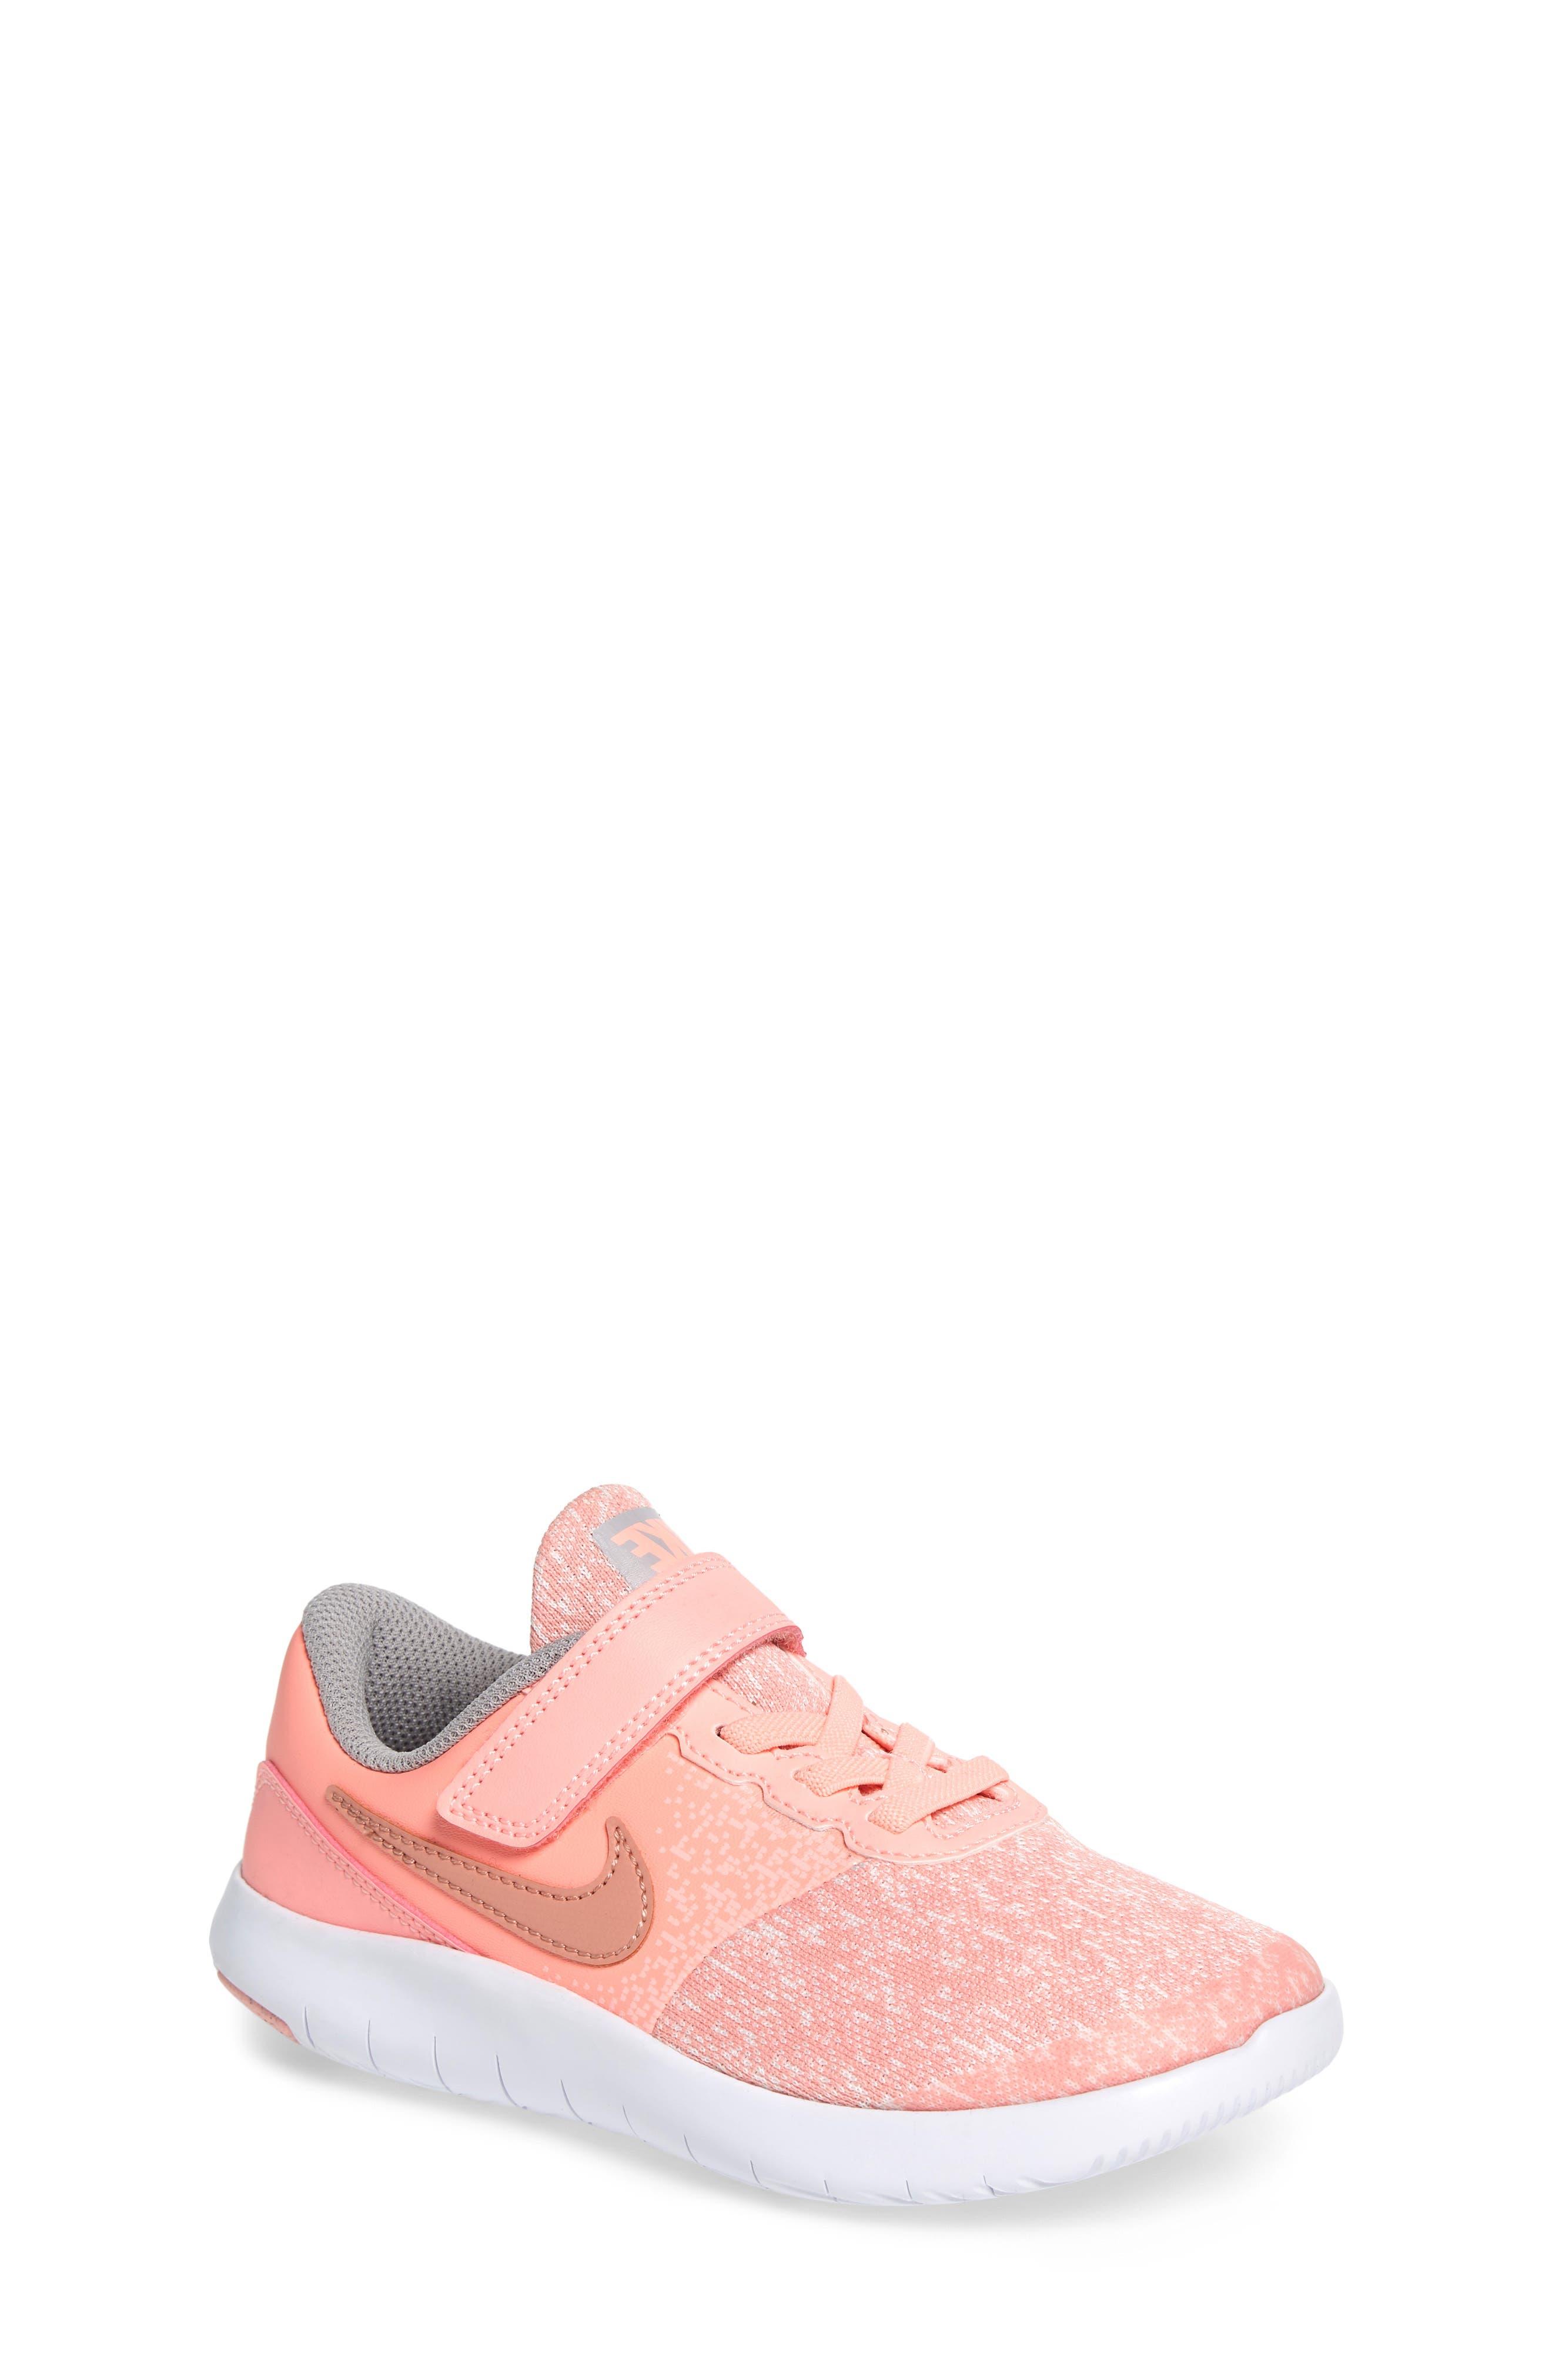 Flex Contact Running Shoe,                             Main thumbnail 1, color,                             Rose Gold/ Storm Pink